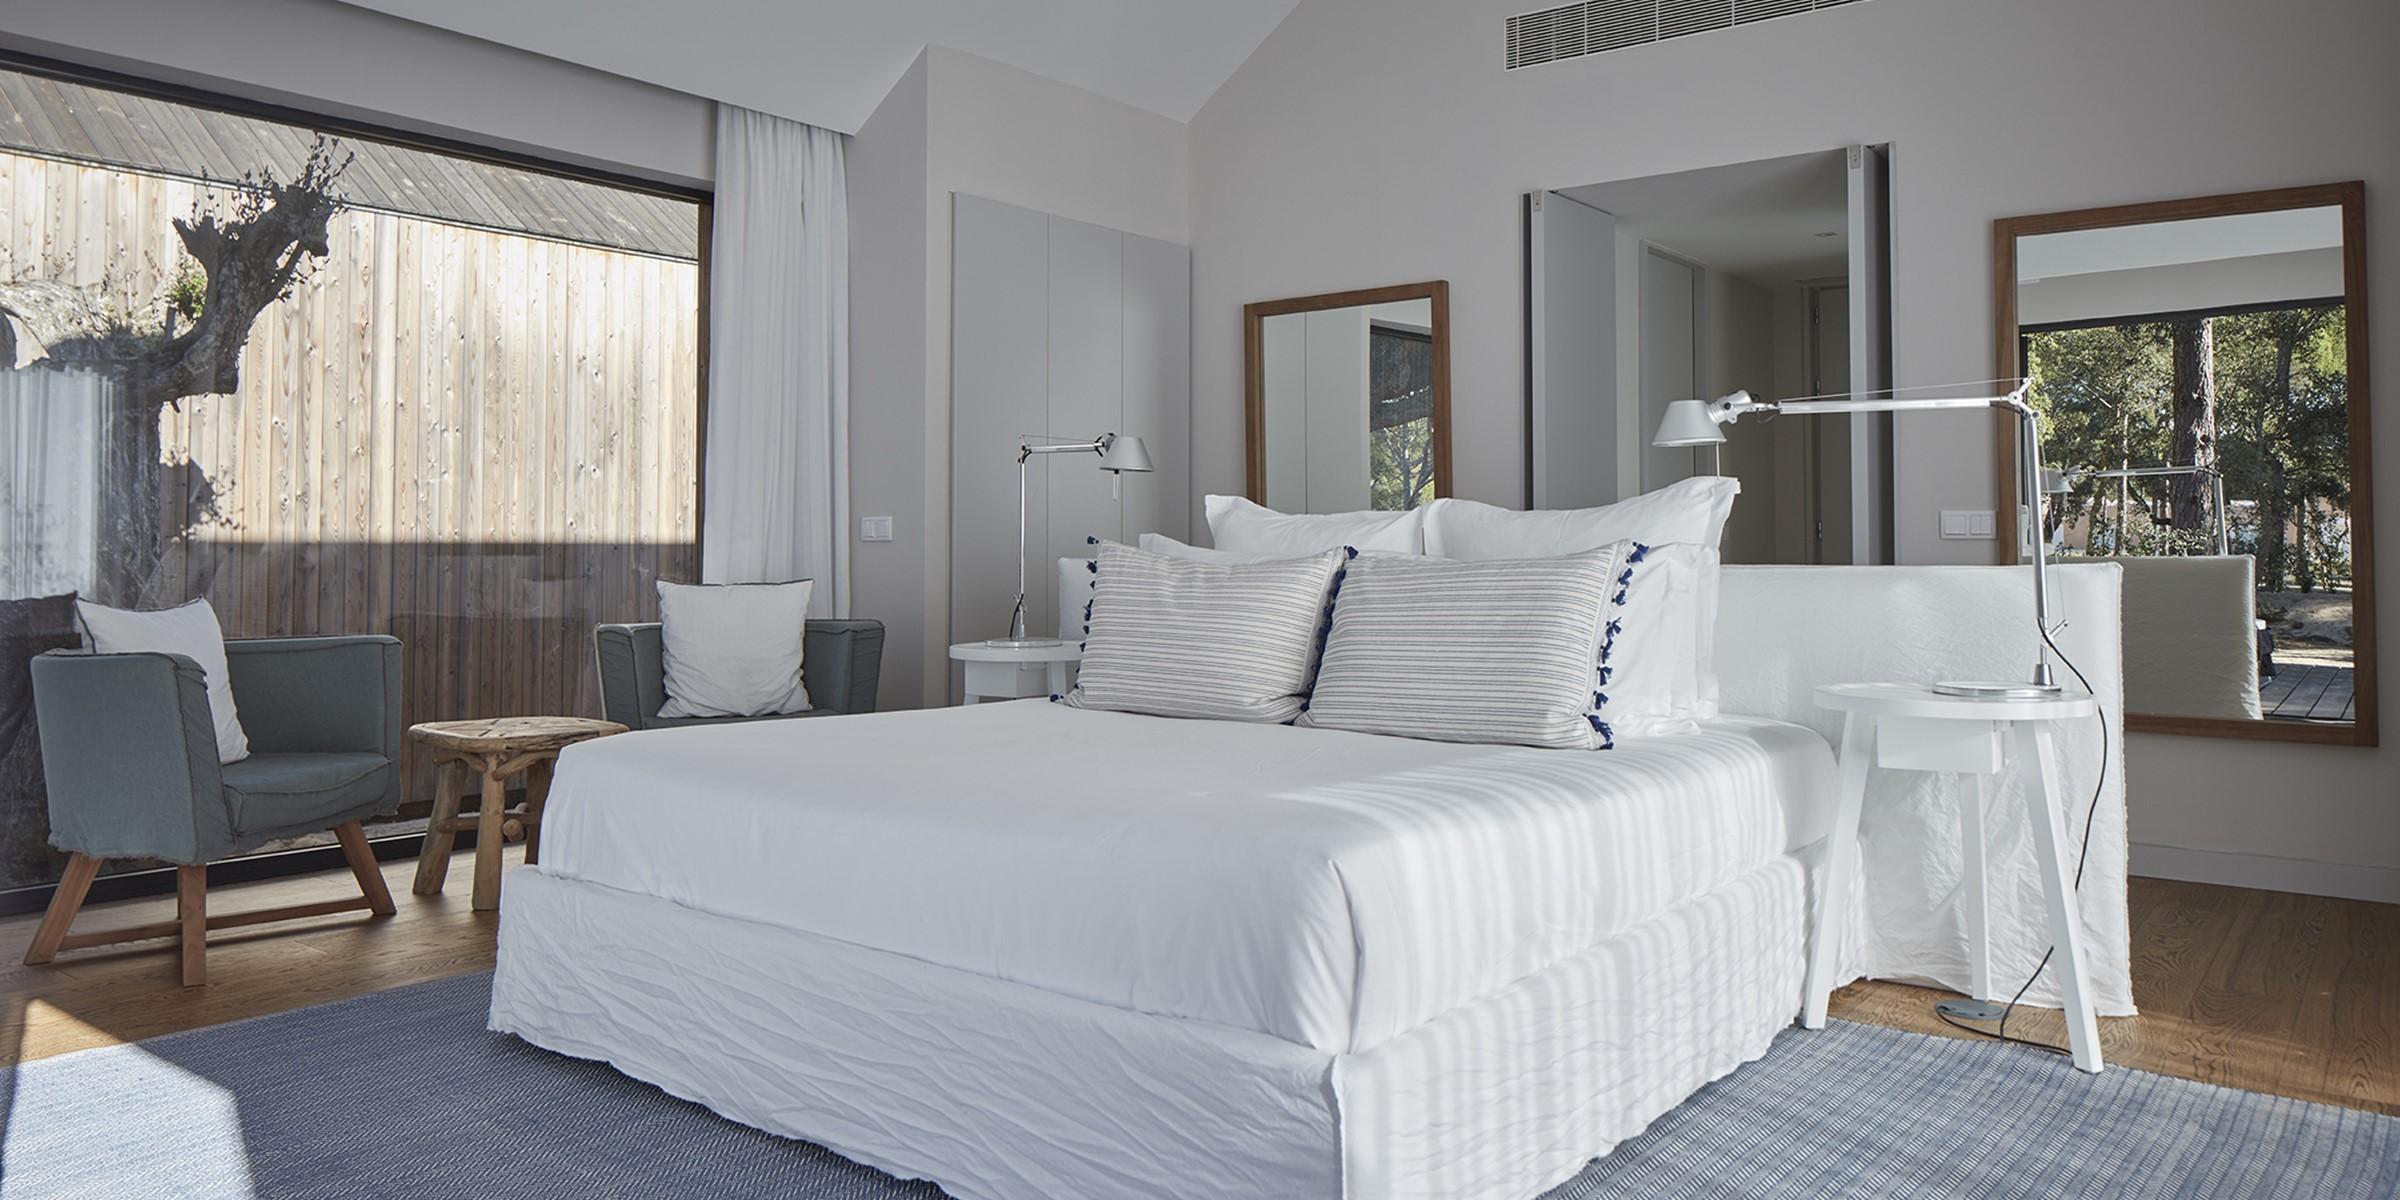 Villa Master Bedroom Sublime Comporta 0262 LR